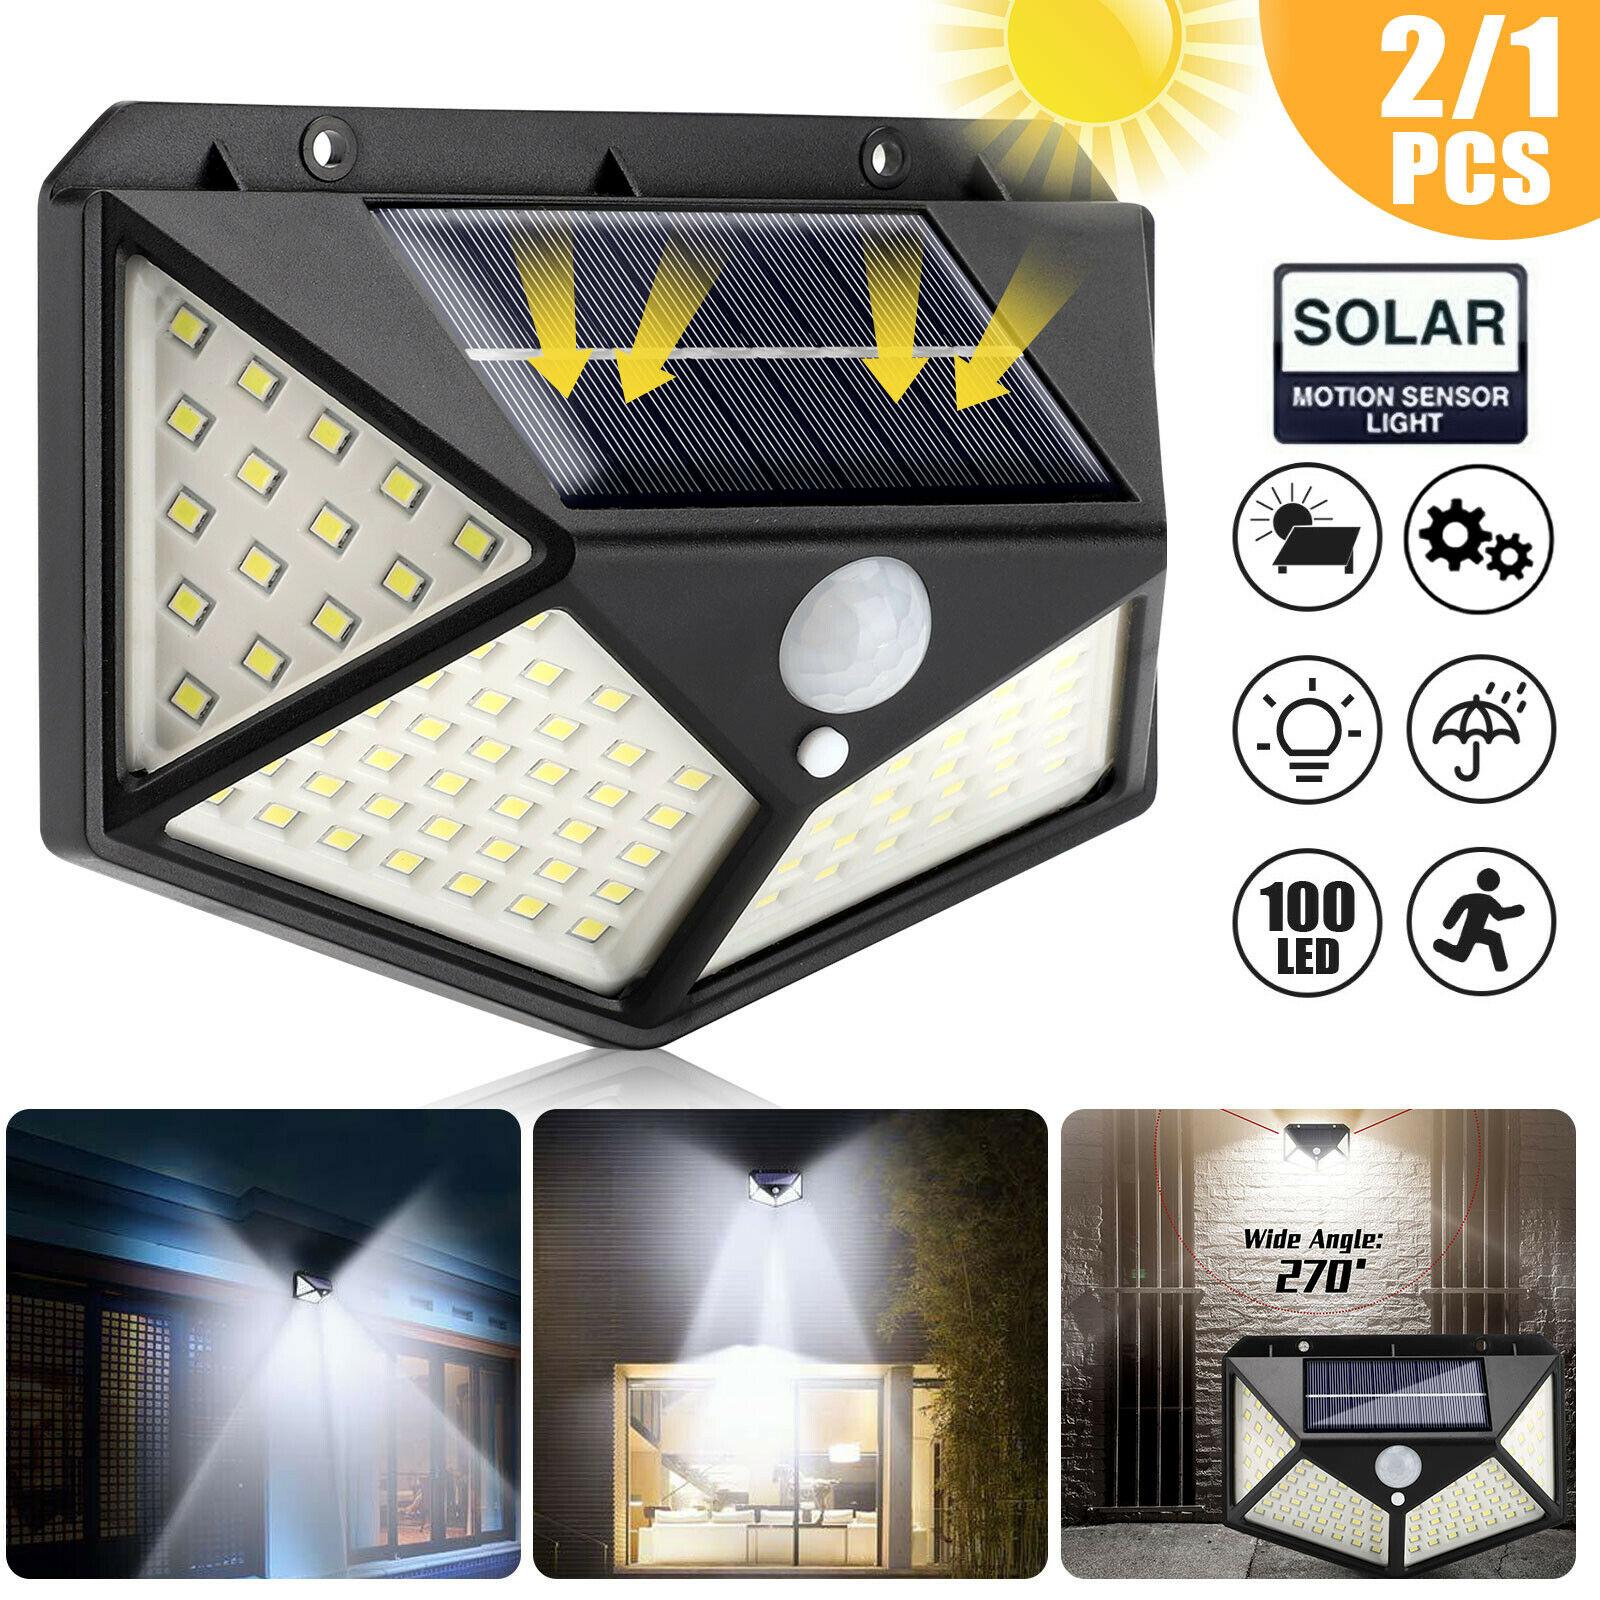 Lampka solarna SHOPLED 100 Led Solar Light za $4.51 / ~17zł